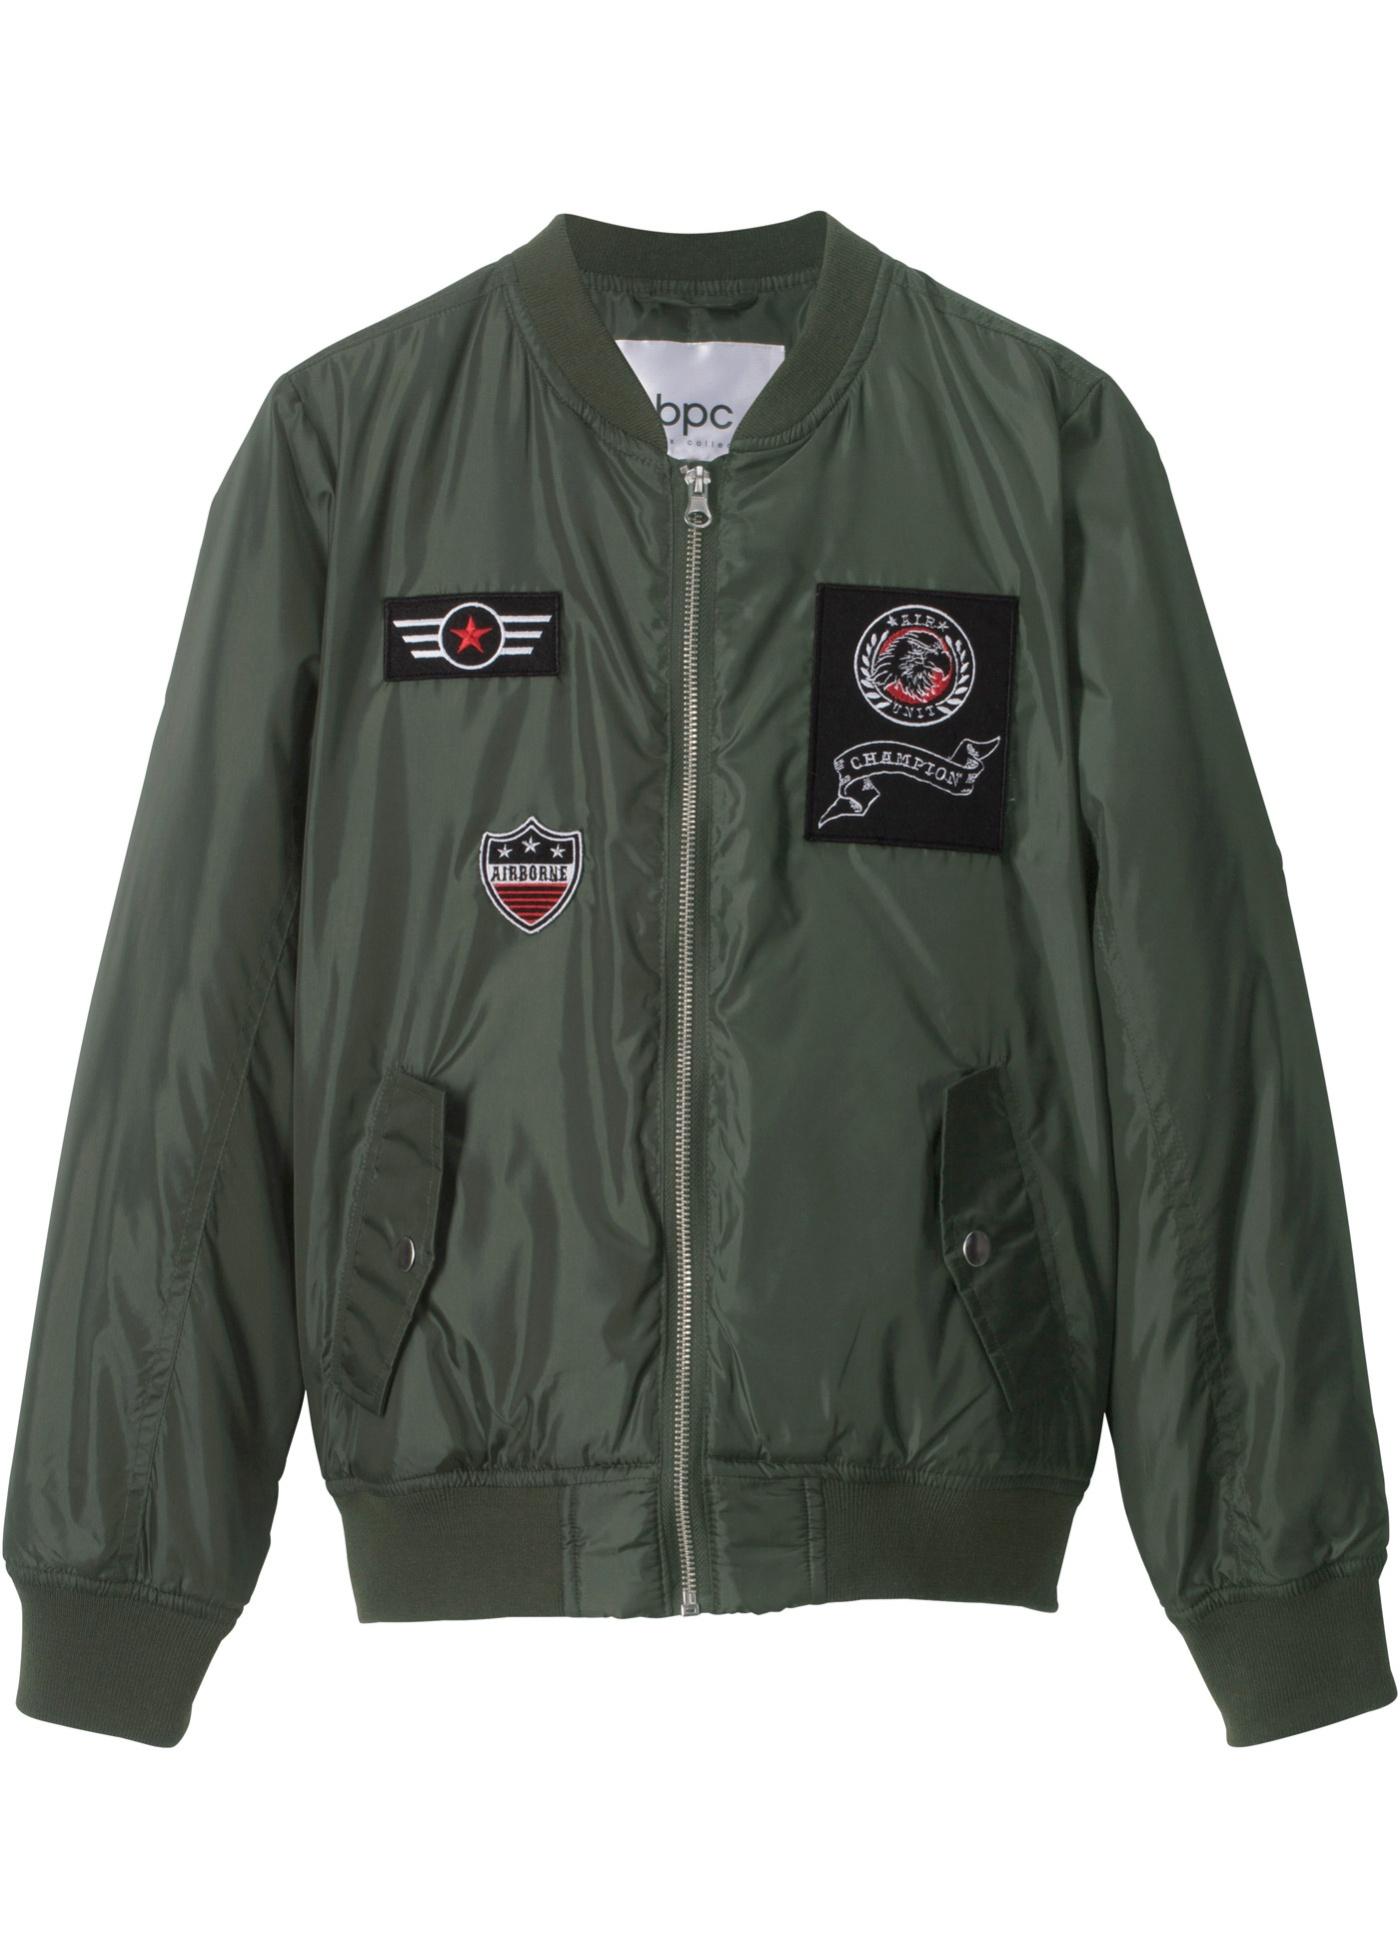 Letecká bunda s nášivkami - Zelená